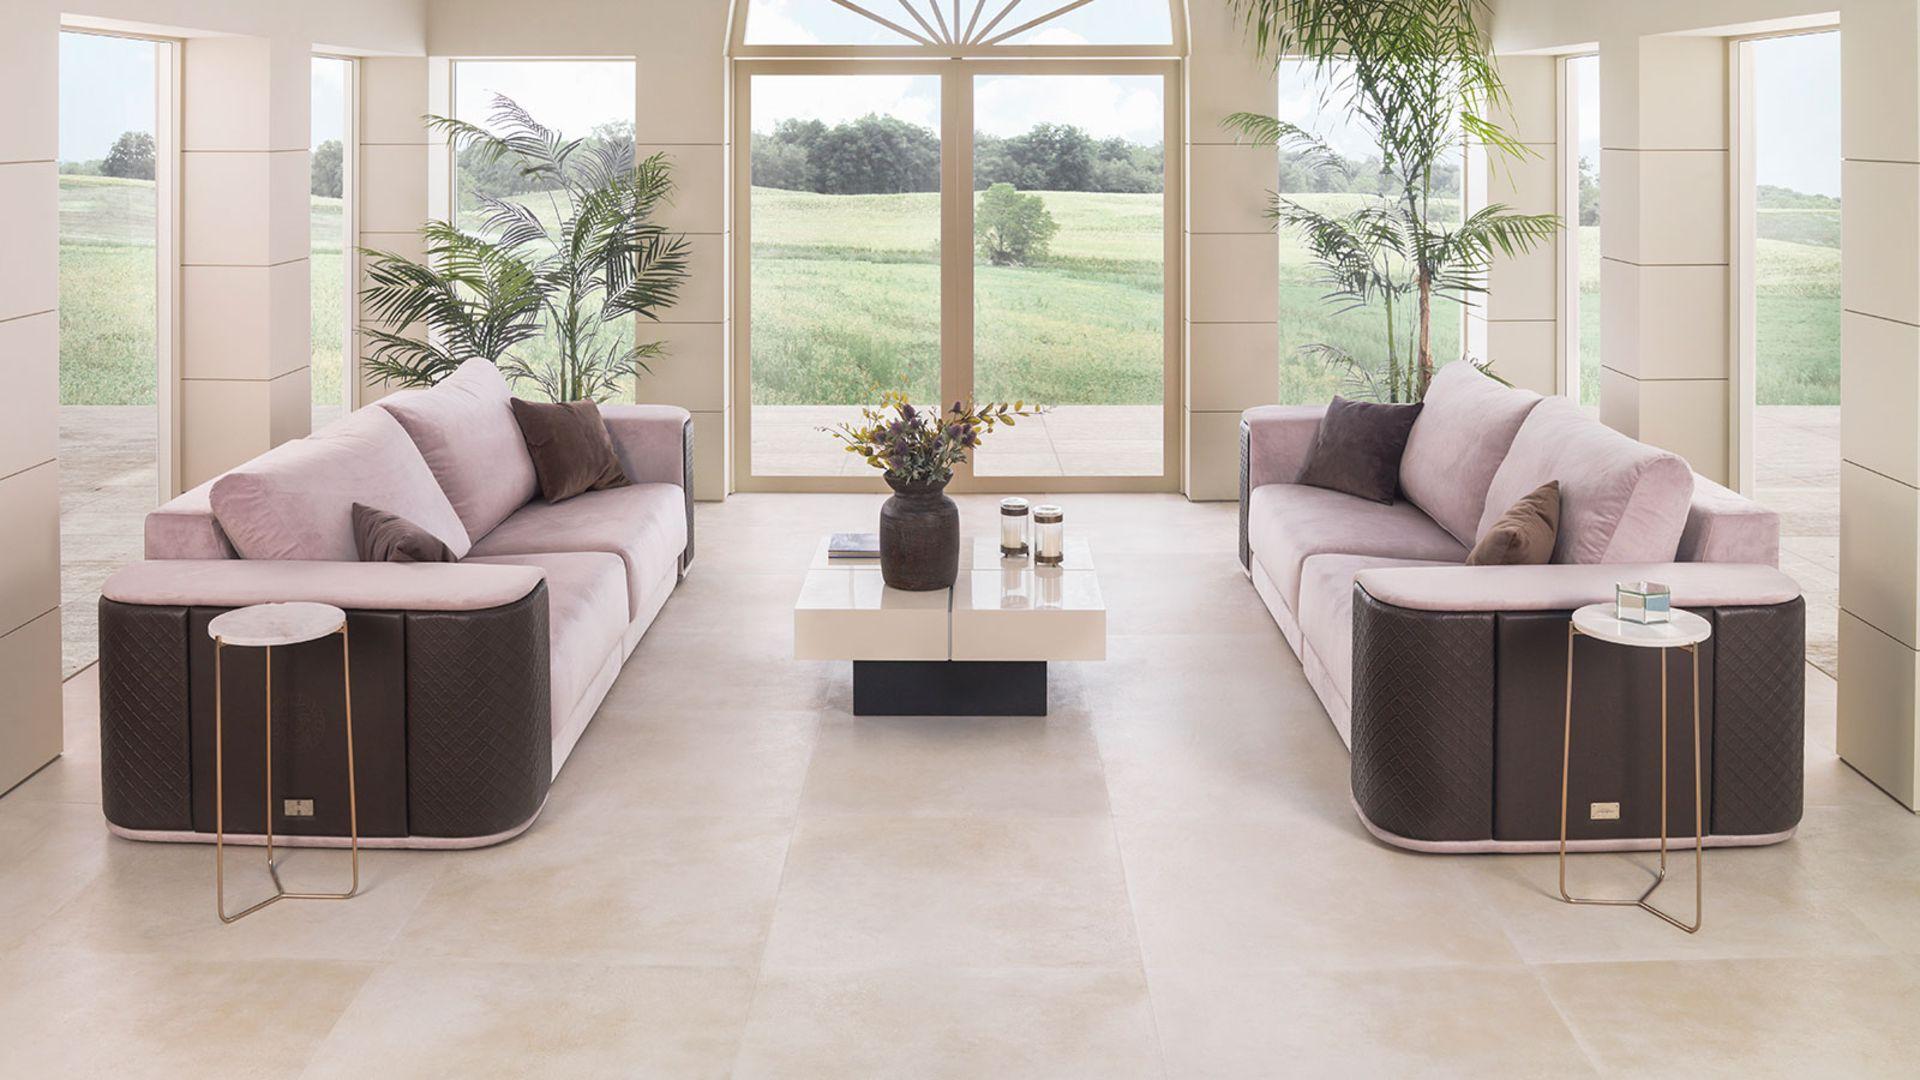 NEW 13.3M2 Porcelanosa Cannes Natural Tiles. 330x100mm per tile. 1.33m per pack. Cannes has the